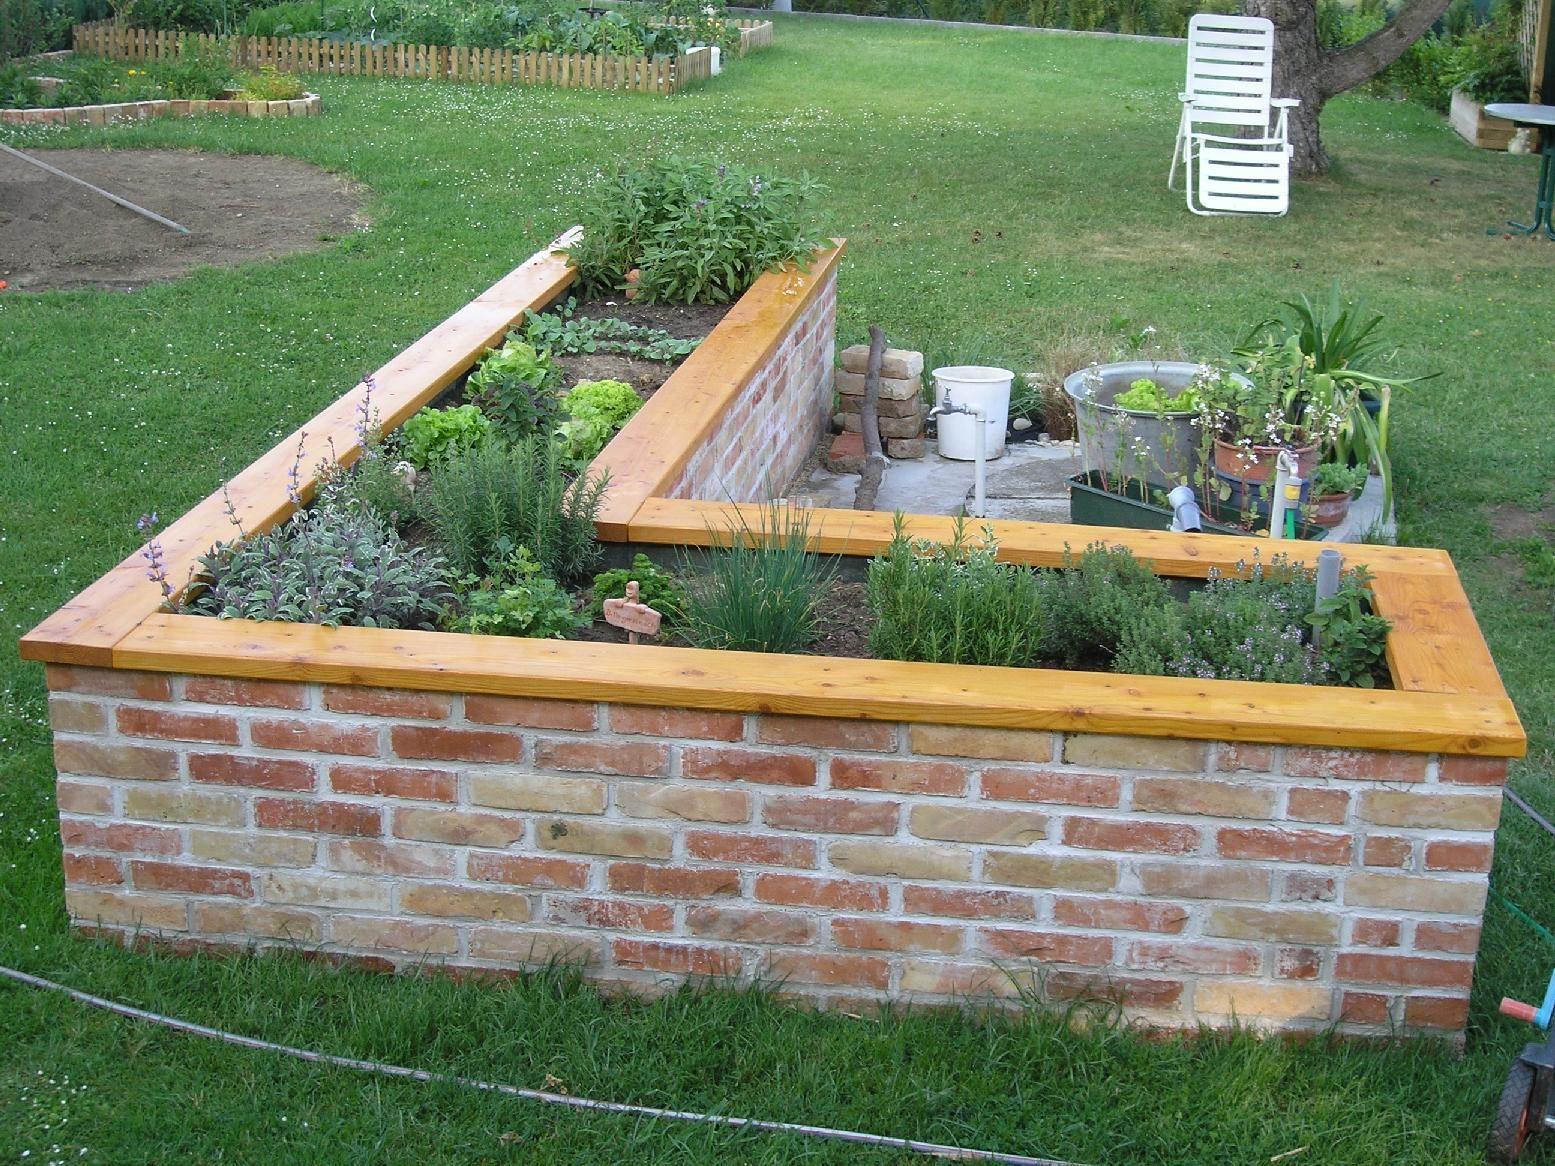 P6040218 Jpg 1 555 1 166 Pixels Garten Hochbeet Garten Hochbeet